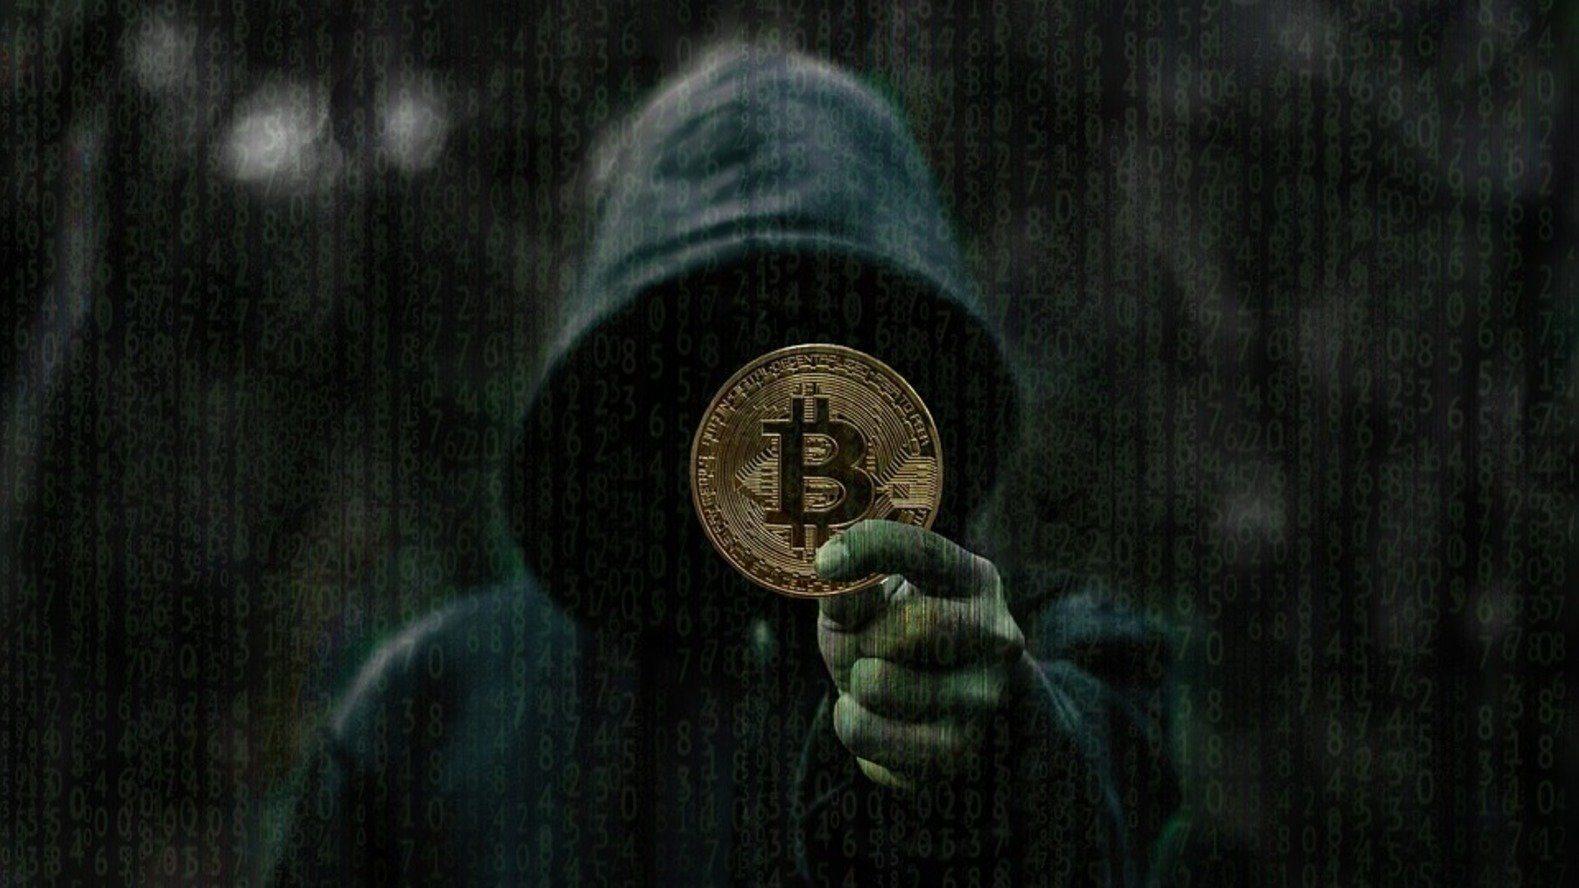 giá bitcoin: Sẽ ra sao nếu Satoshi Nakamoto không còn ẩn danh?